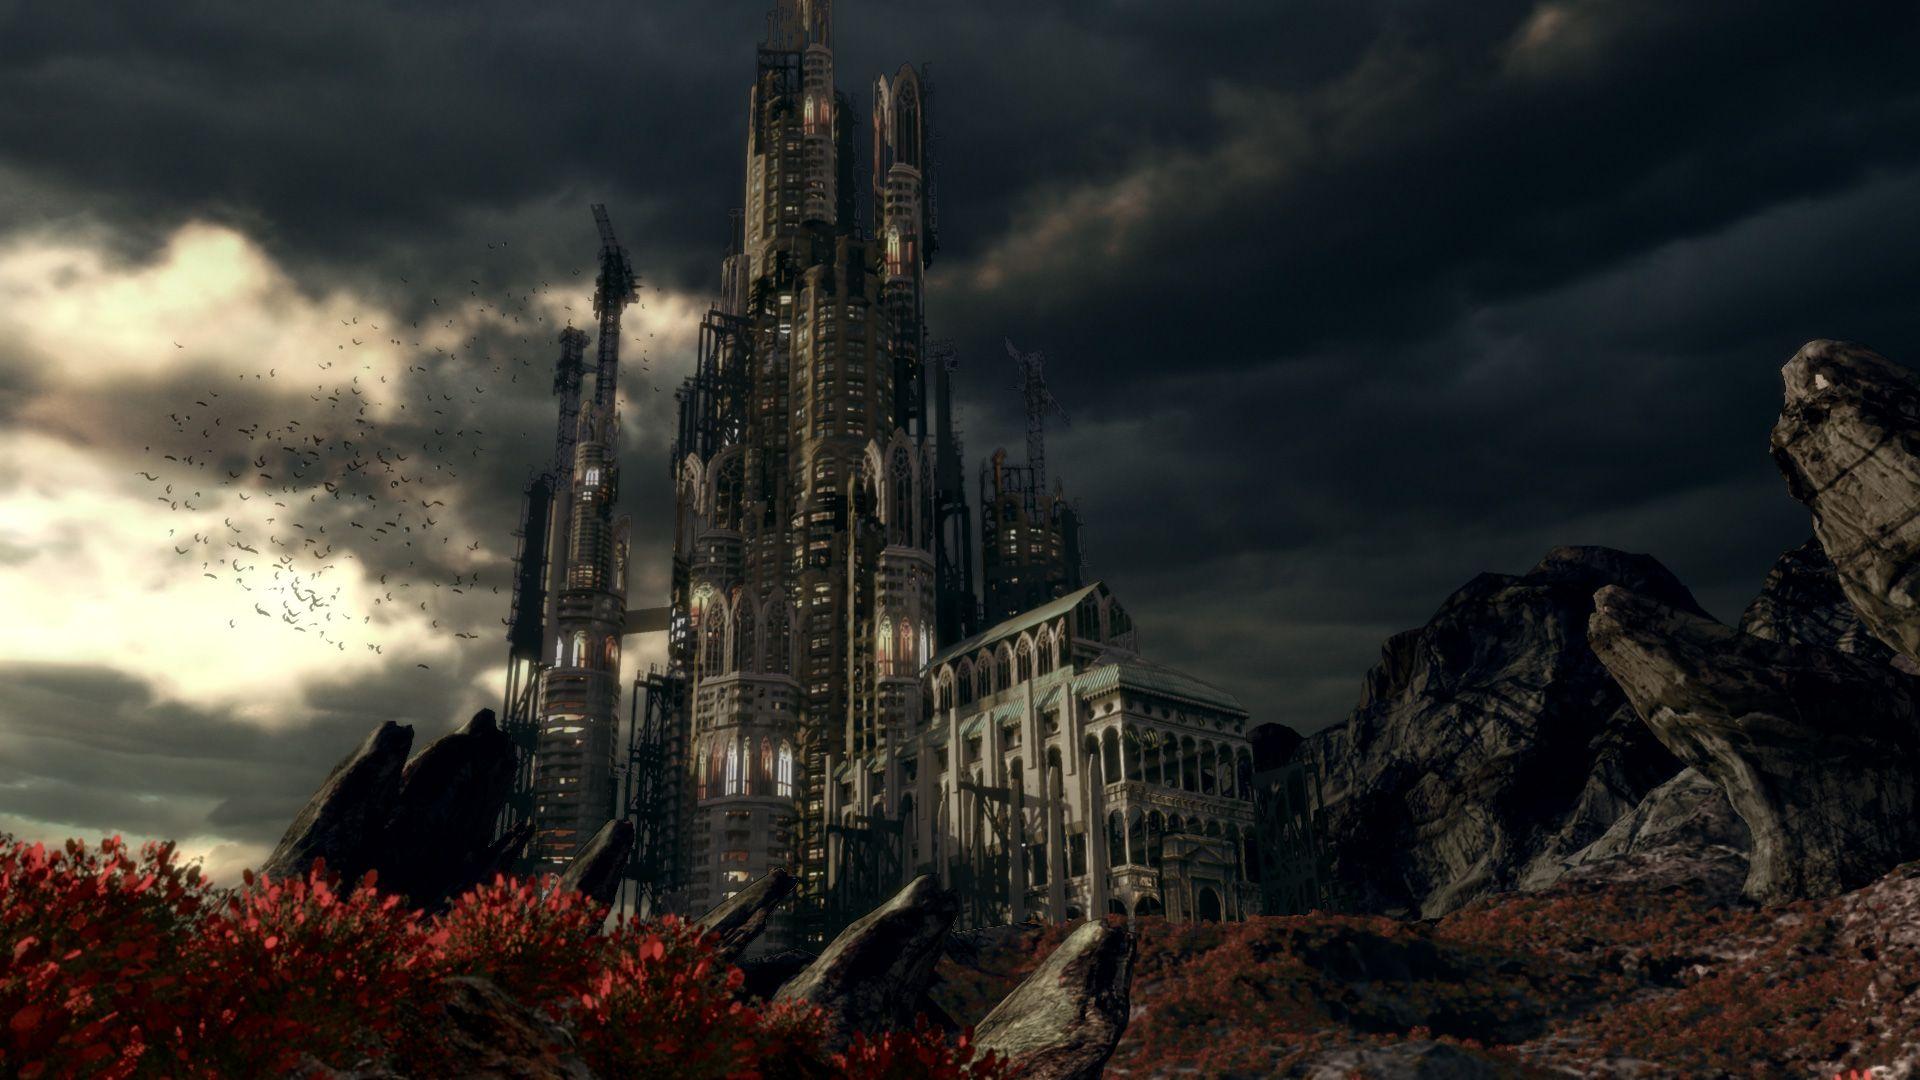 The castle rolepages random pinterest fantasy for Final fantasy 8 architecture